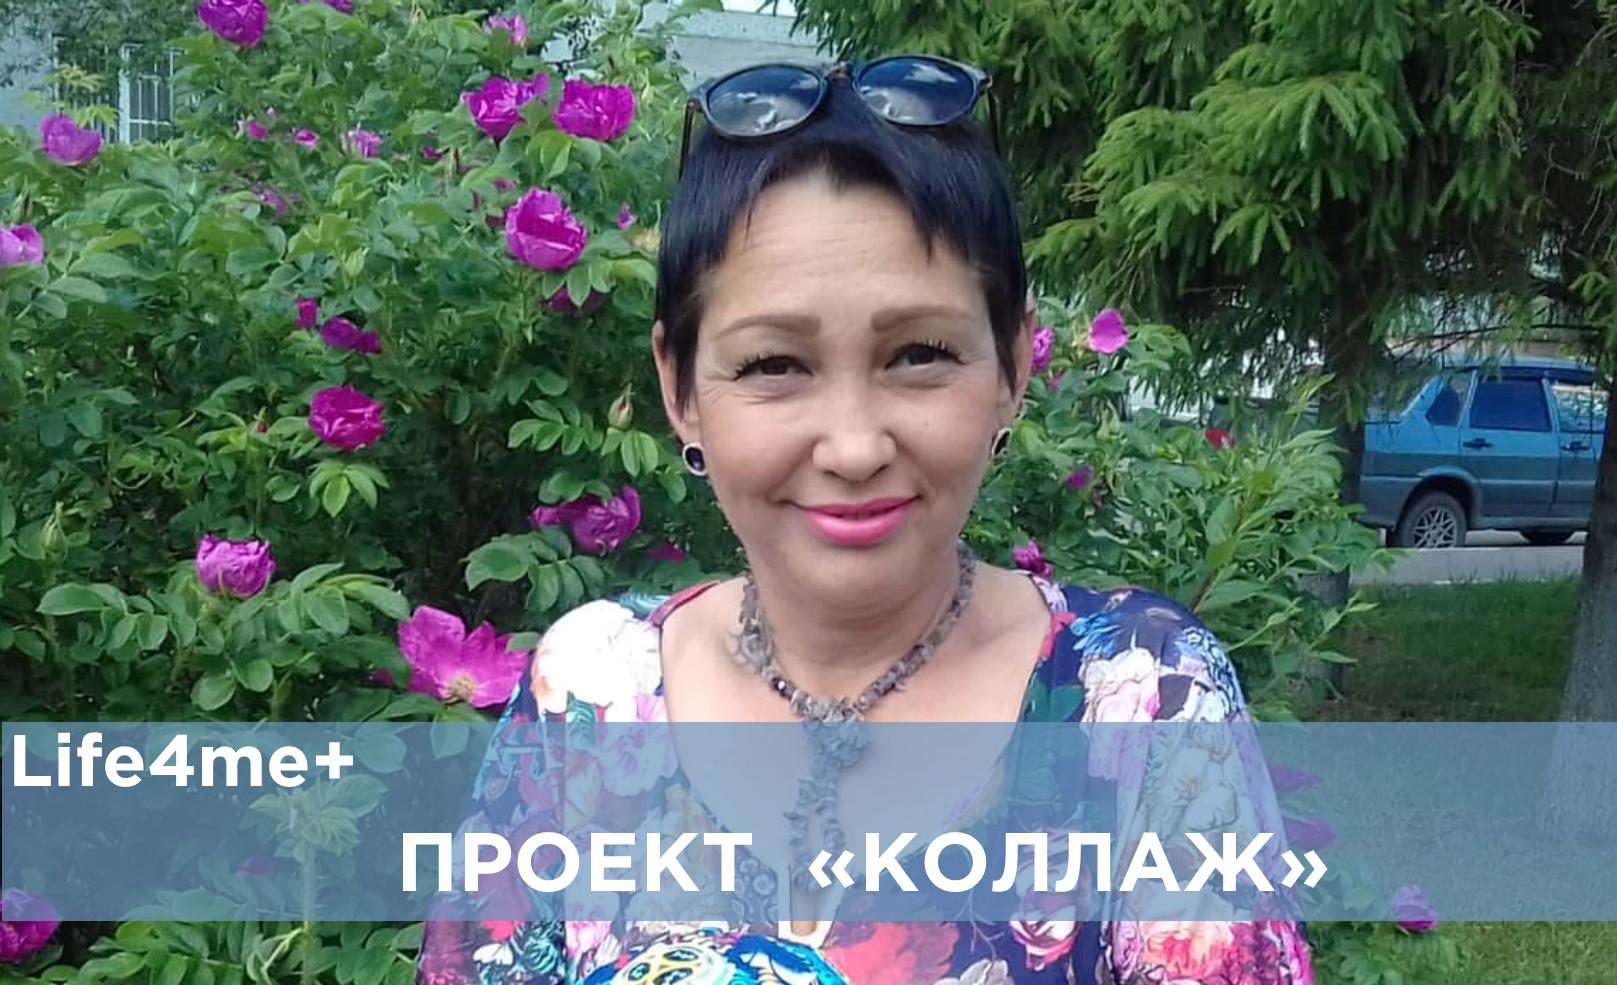 «Коллаж»: Юлия Заикина, г. Омск, Россия